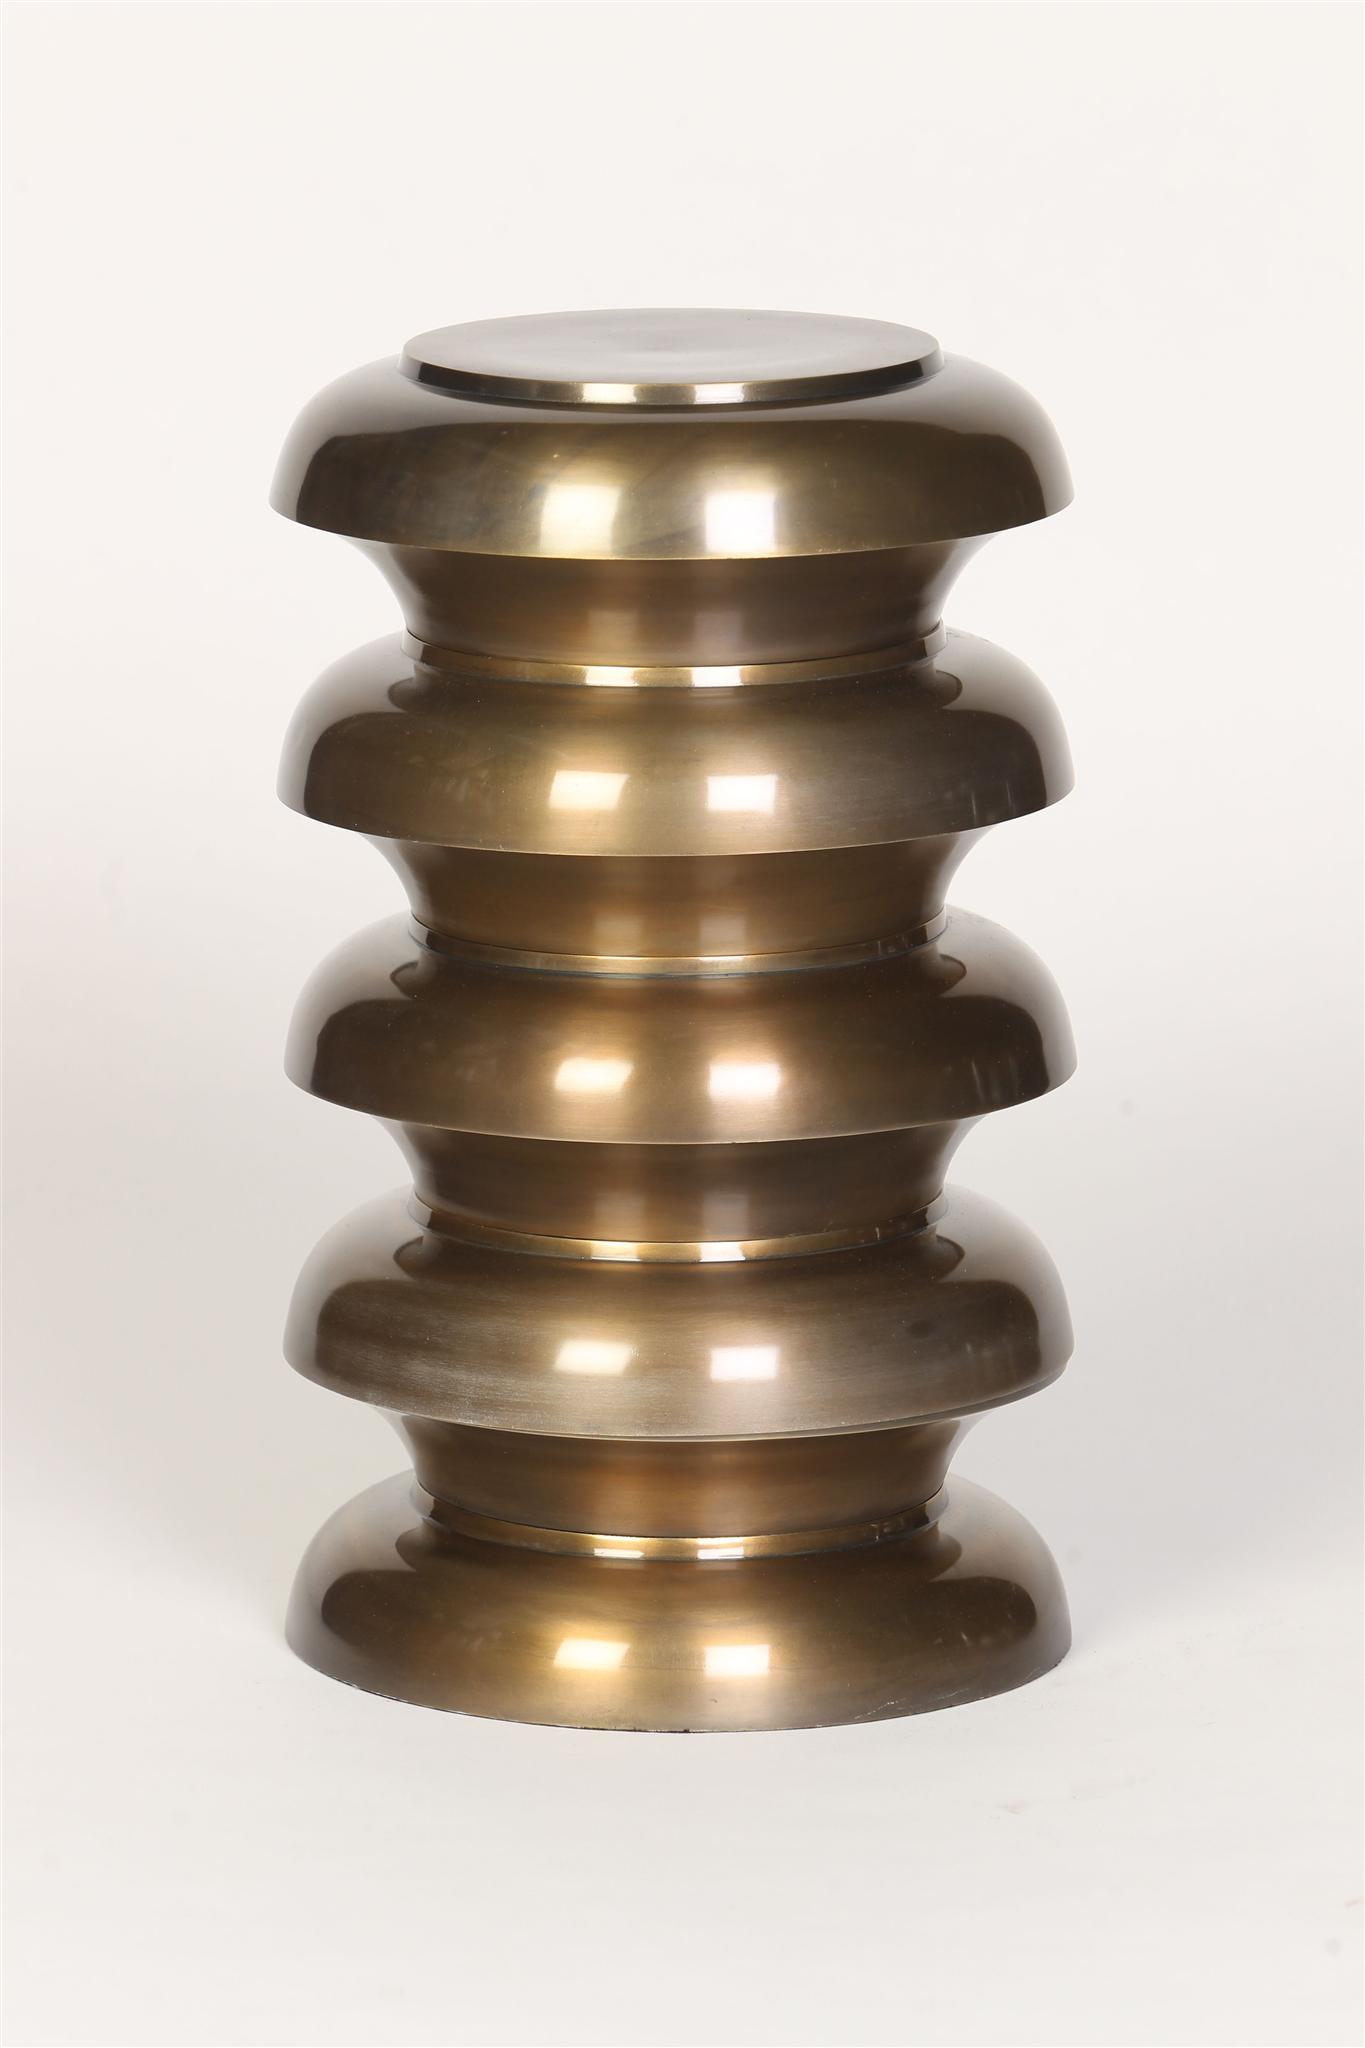 Cast Aluminum Stacked Round Garden Stool in Antique Brass Finish ...